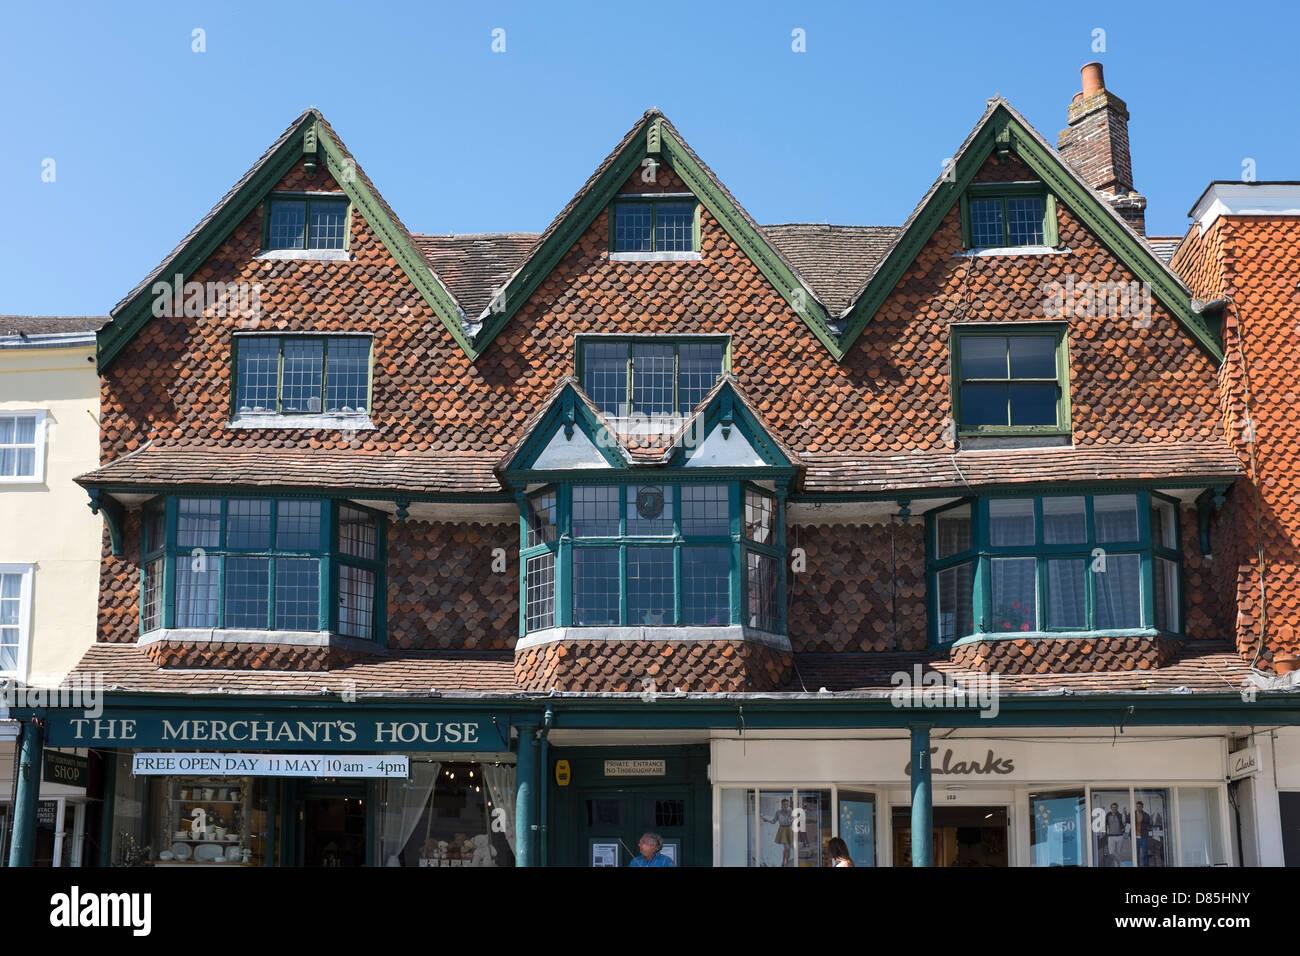 The Merchants House Marlborough - Stock Image